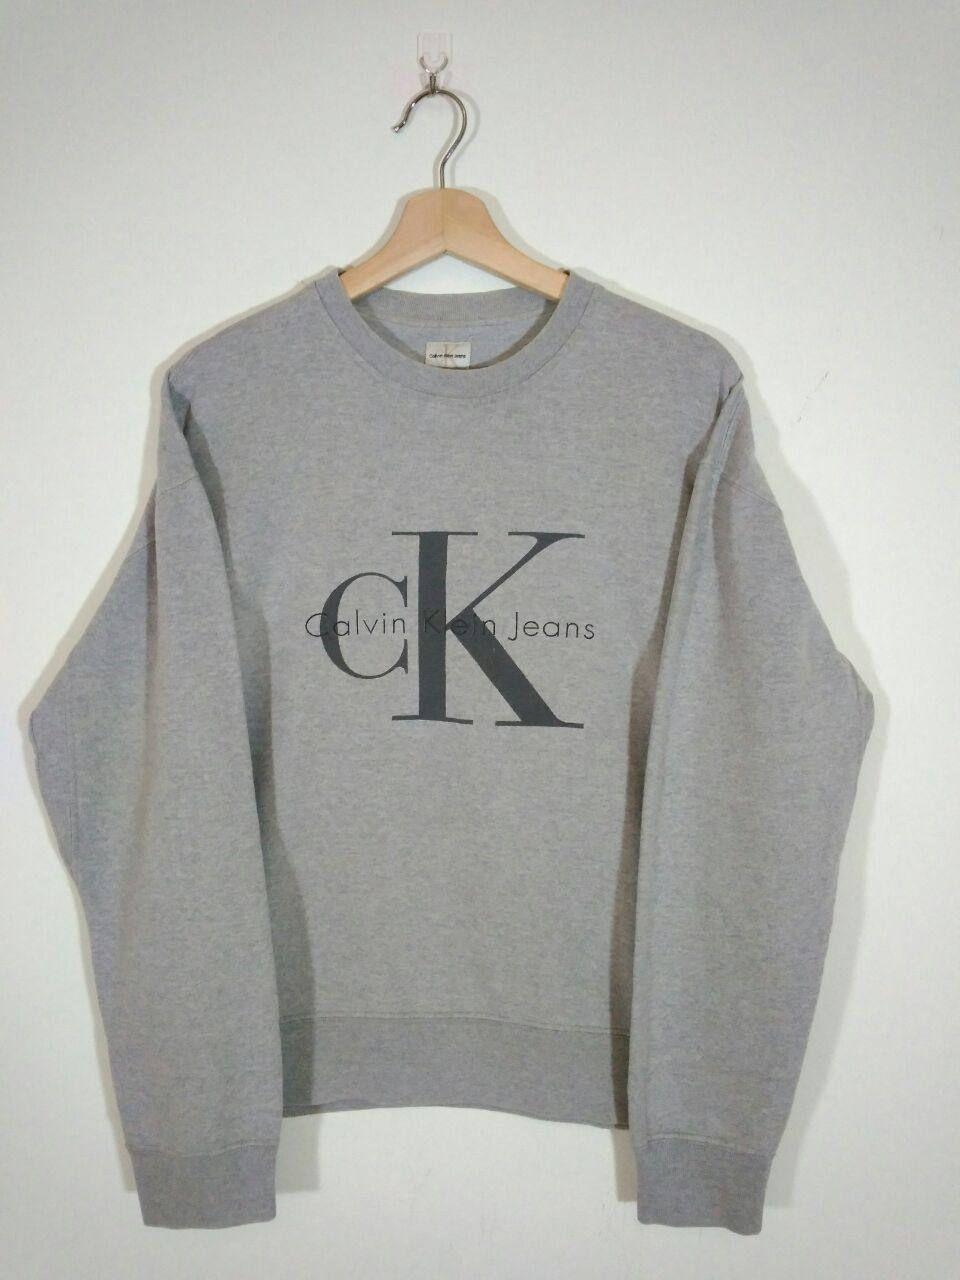 Vintage 90s Calvin Klein Jeans Big Logo Crewneck Grey Sweatshirt Sweater Jumper Size M Sweatshirts Calvin Klein Sweatshirts Calvin Klein Jeans